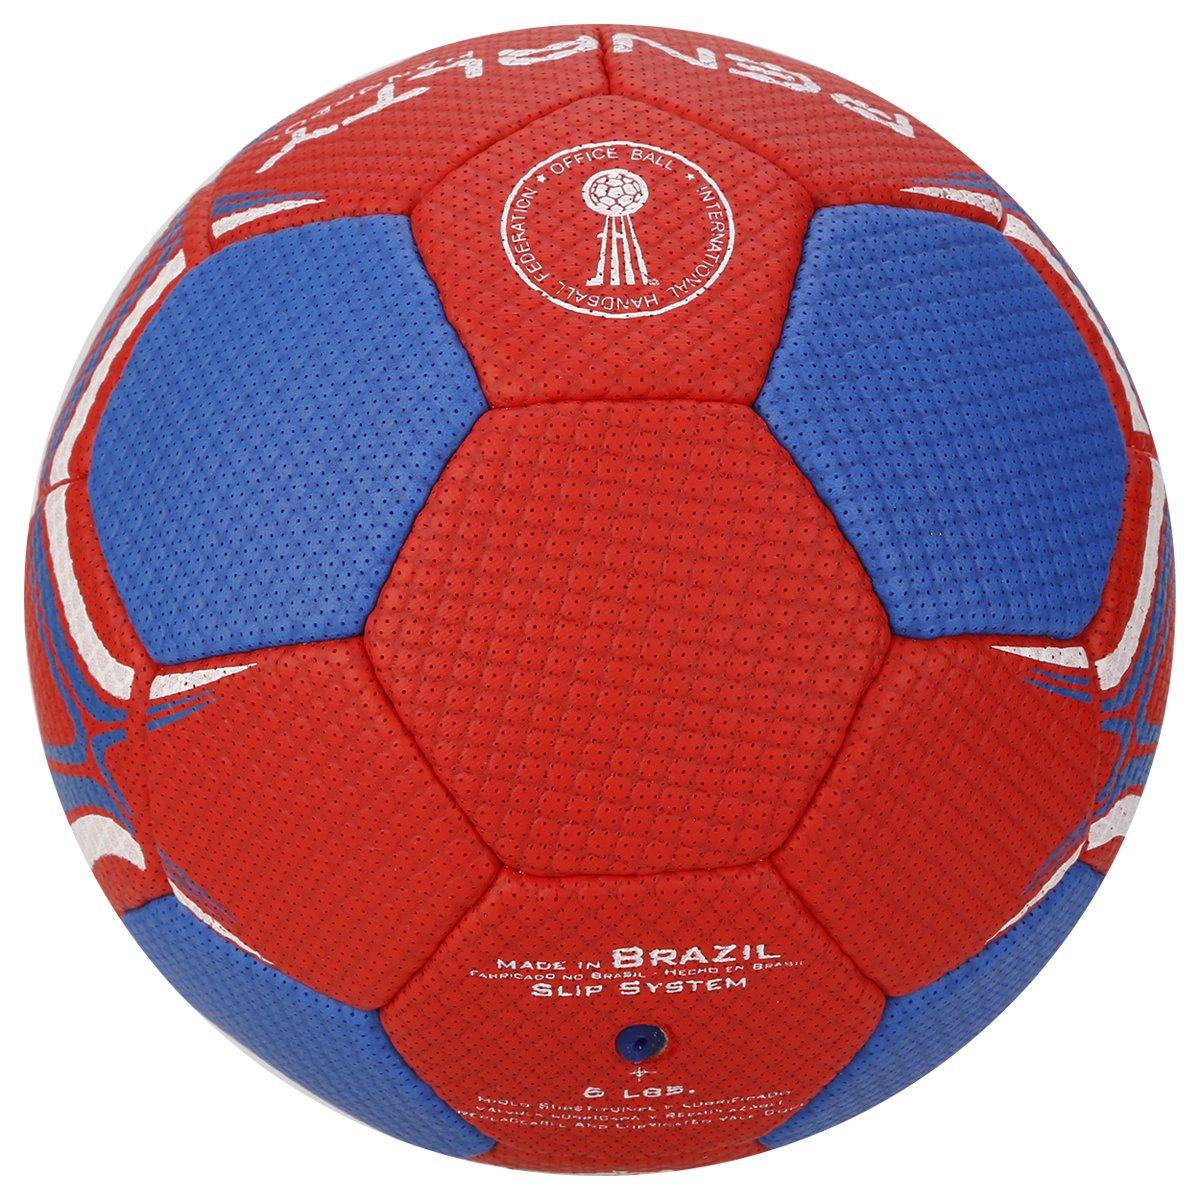 f54ab1b6c4 Bola de Handebol Penalty Suécia H3L Ultra Grip 4 - Compre Agora ...